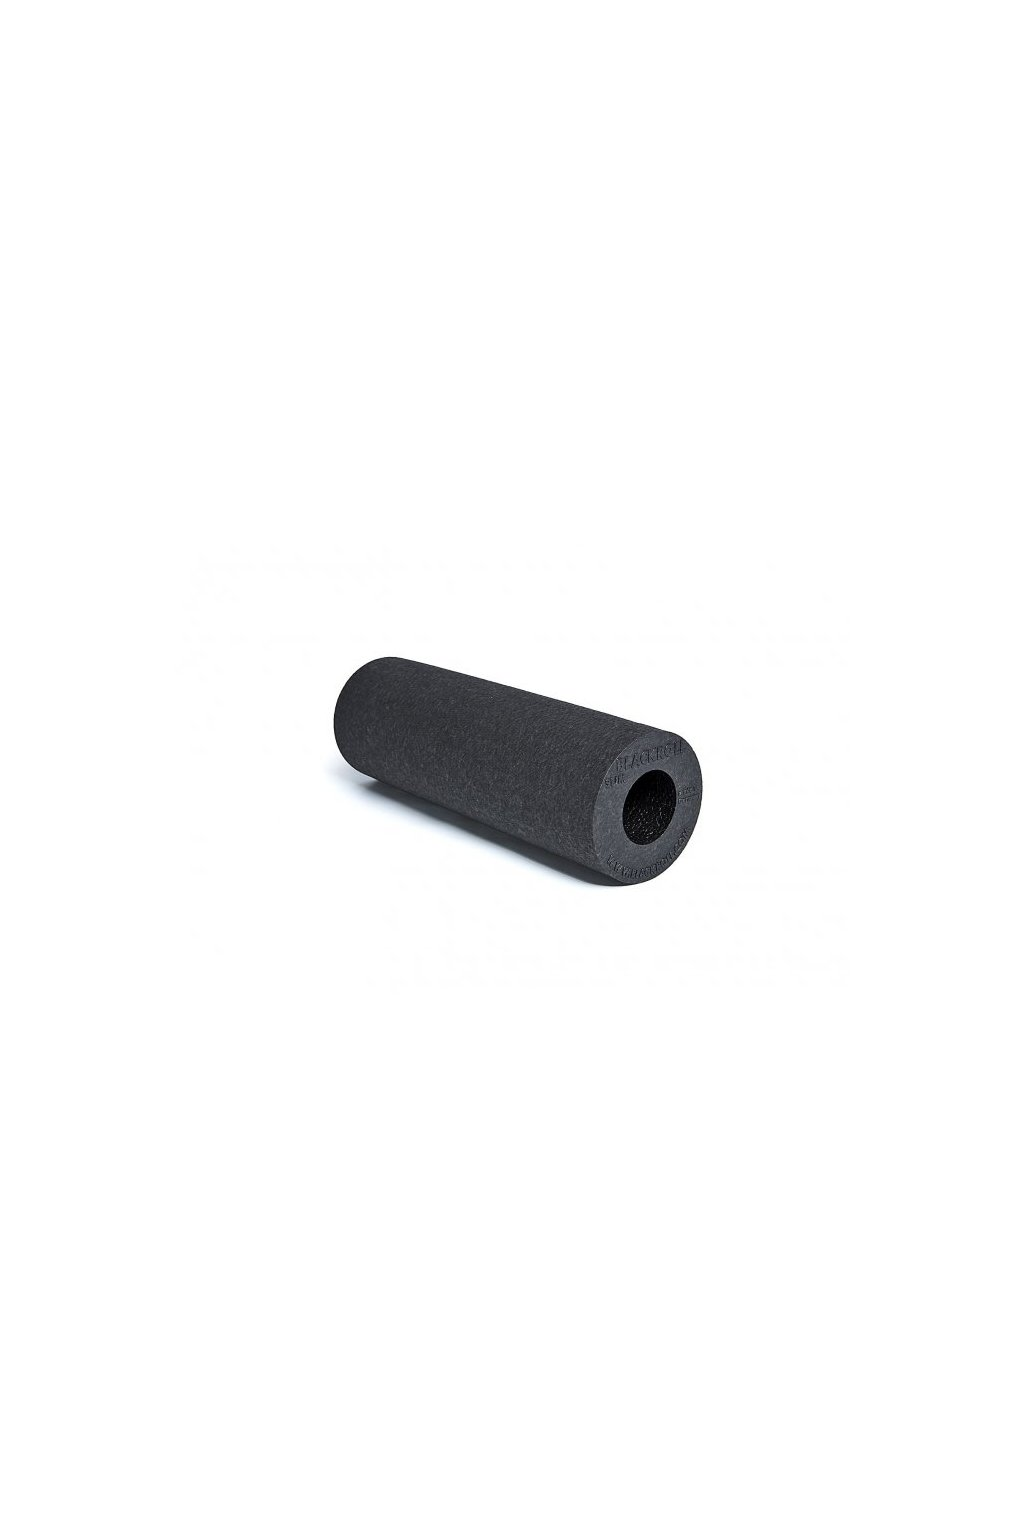 4062 blackroll slim(1)